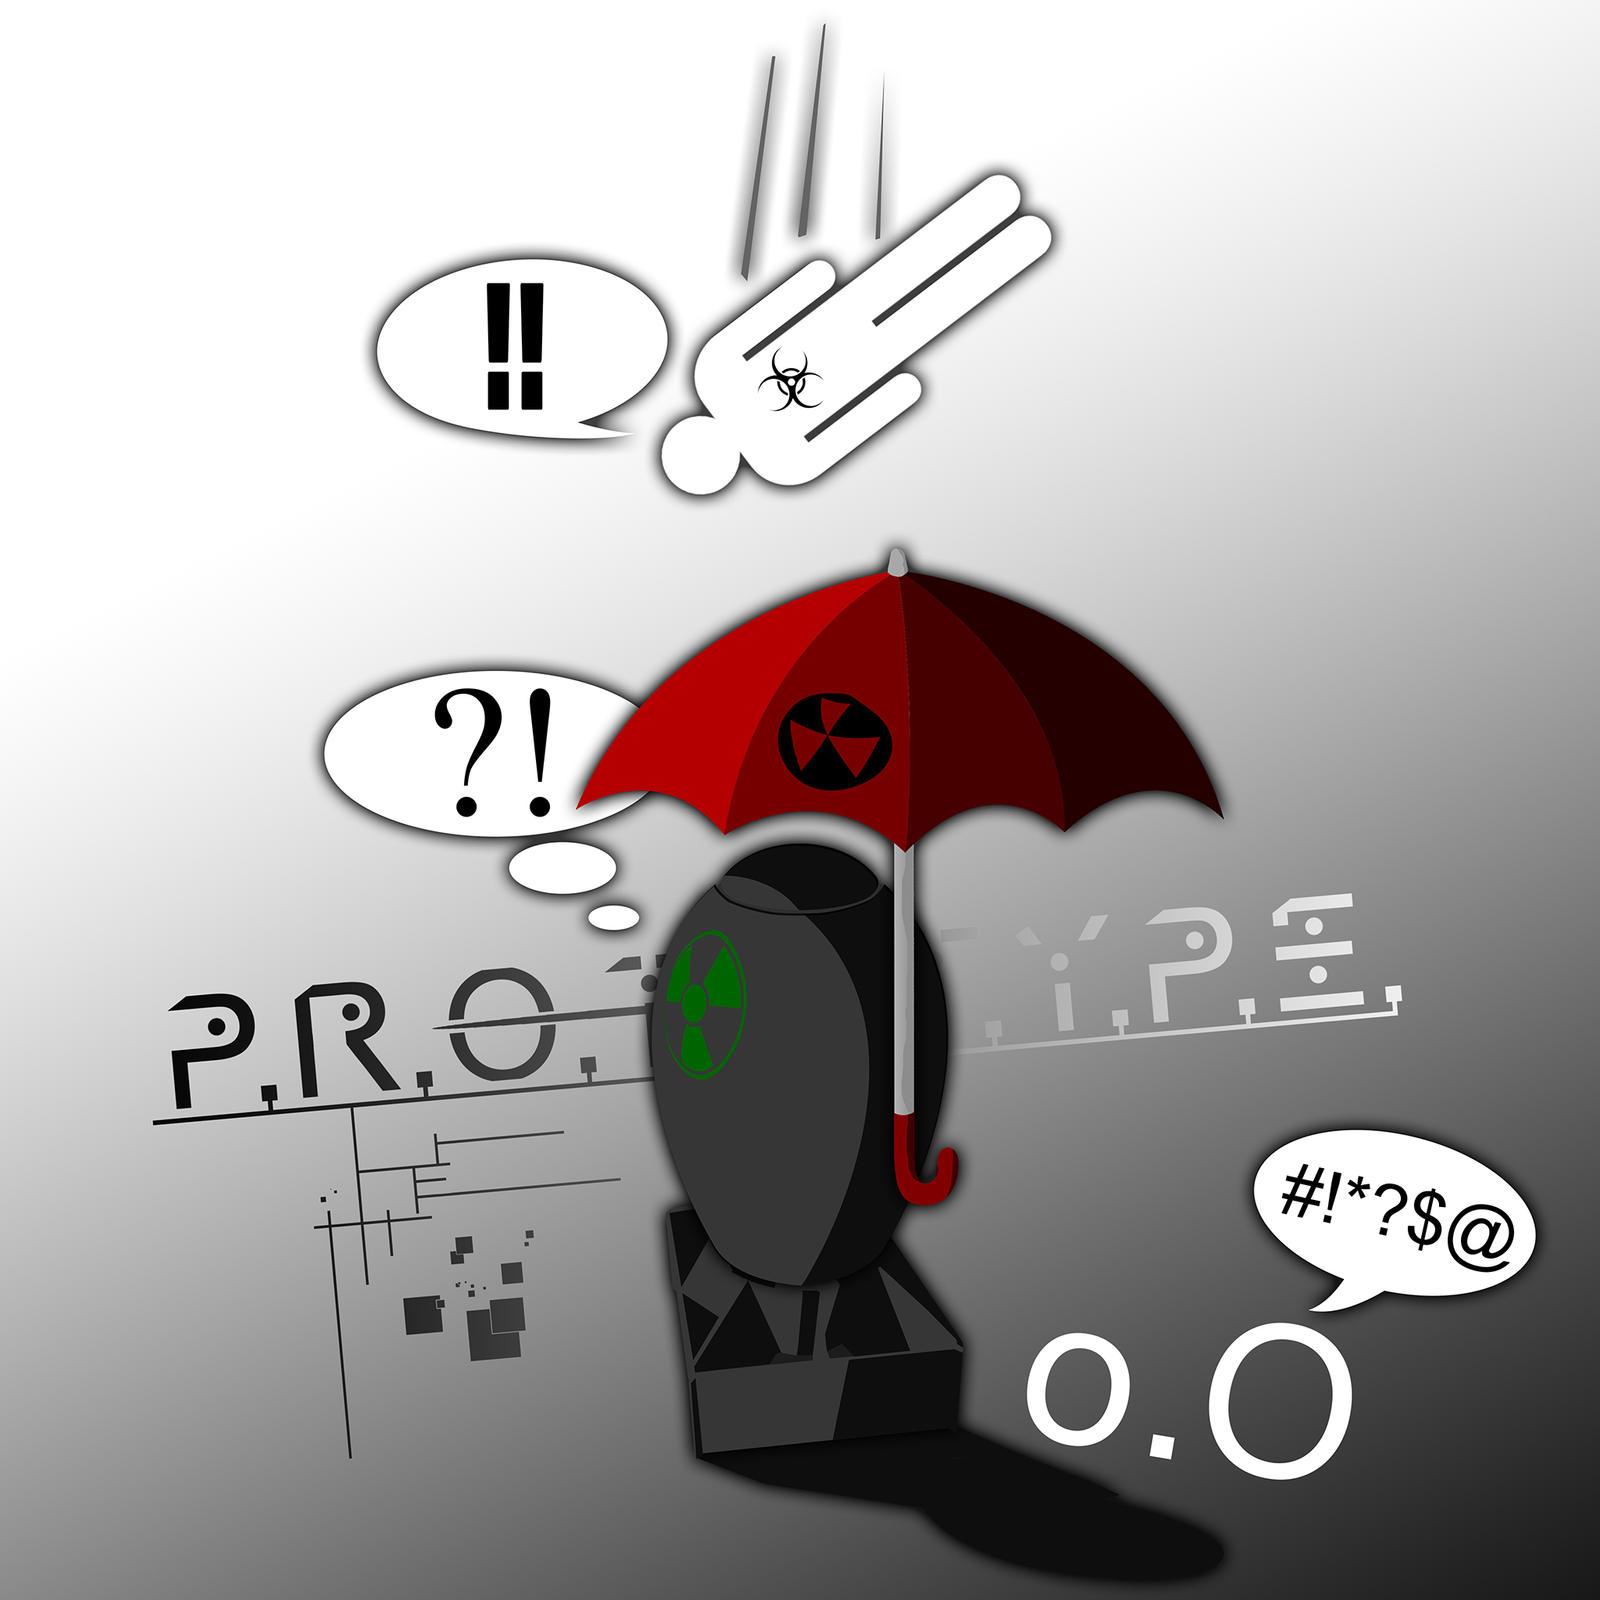 #!*?$@ by P.R.O.T.O.T.Y.P.E.